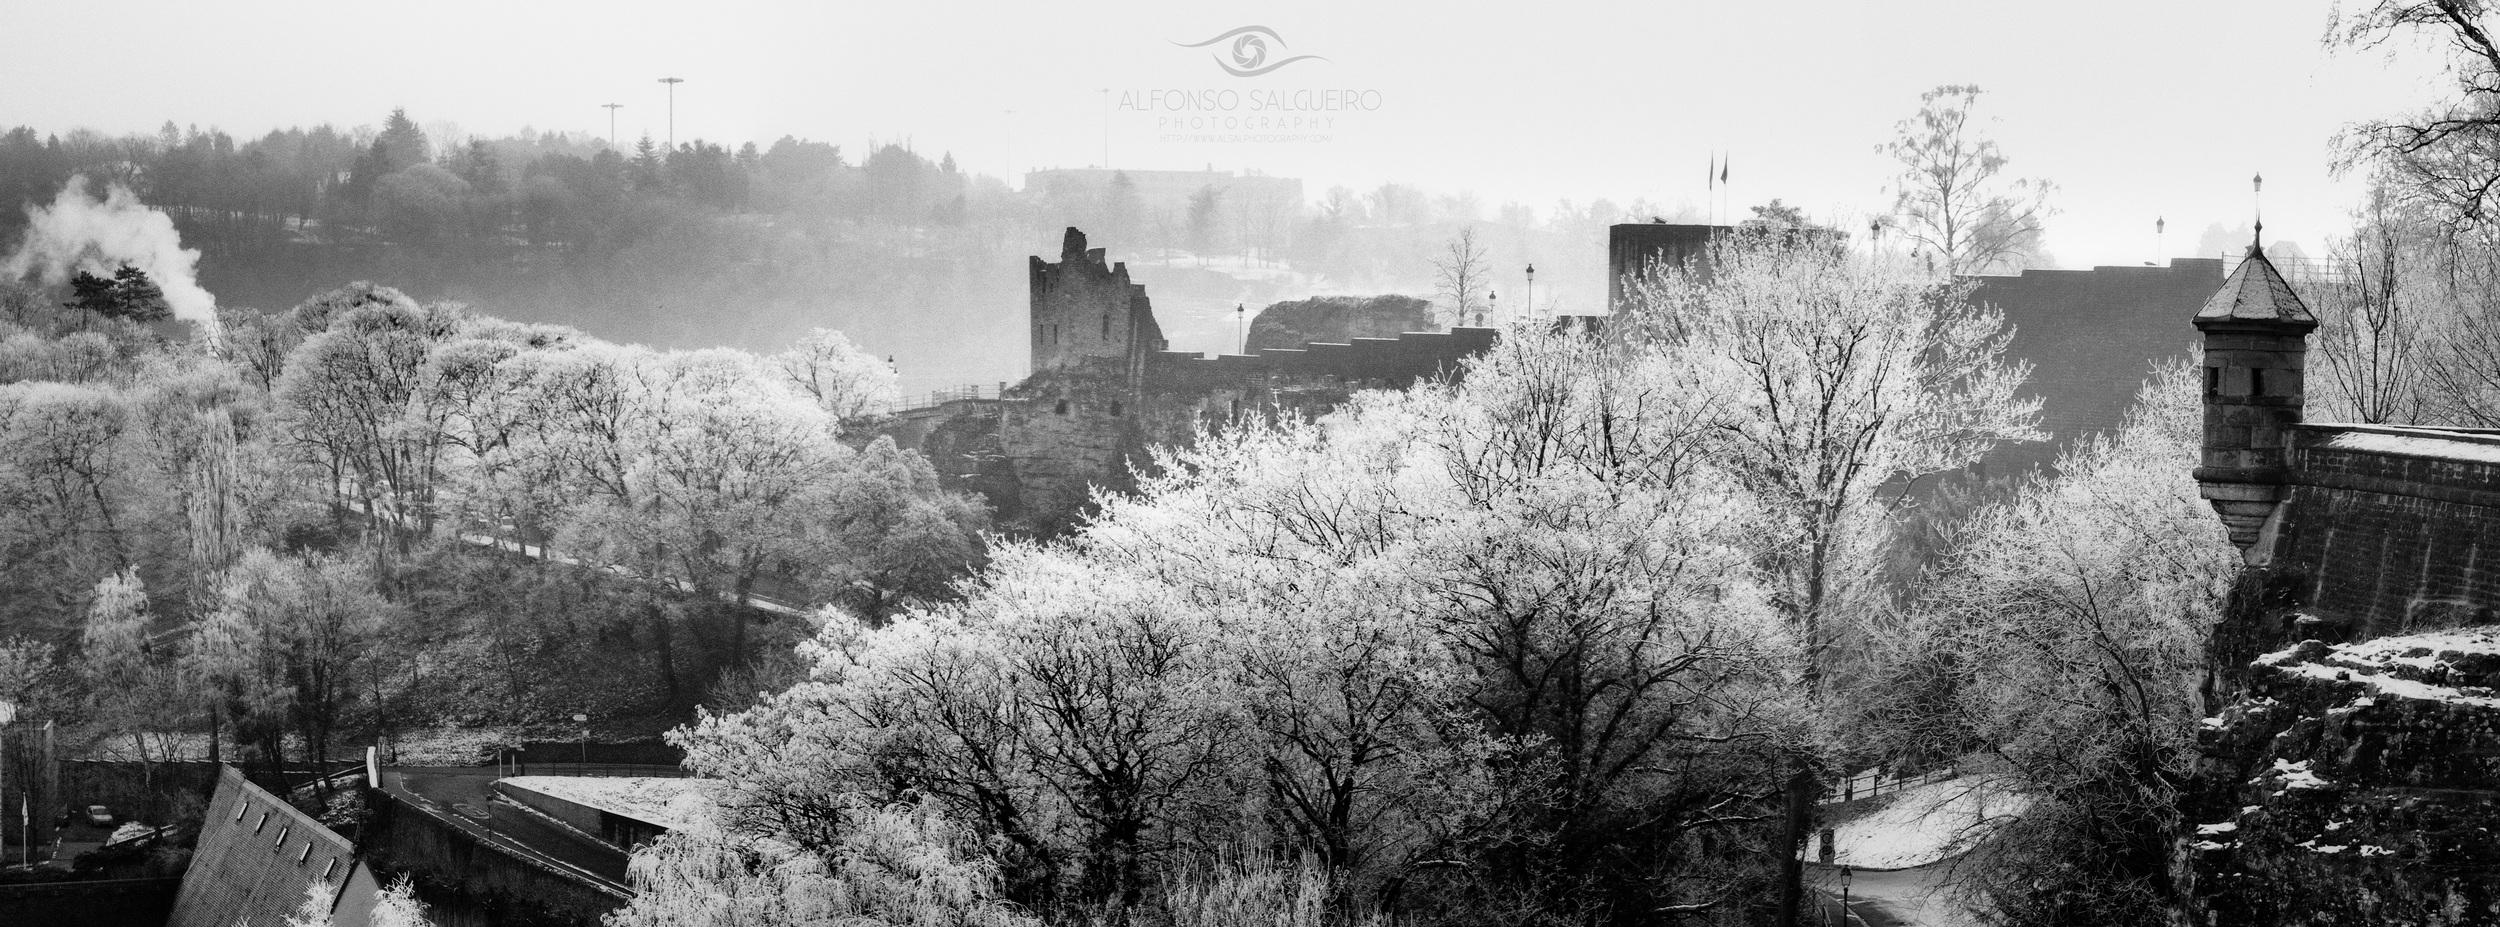 freezing fog Lux city B&W.jpg